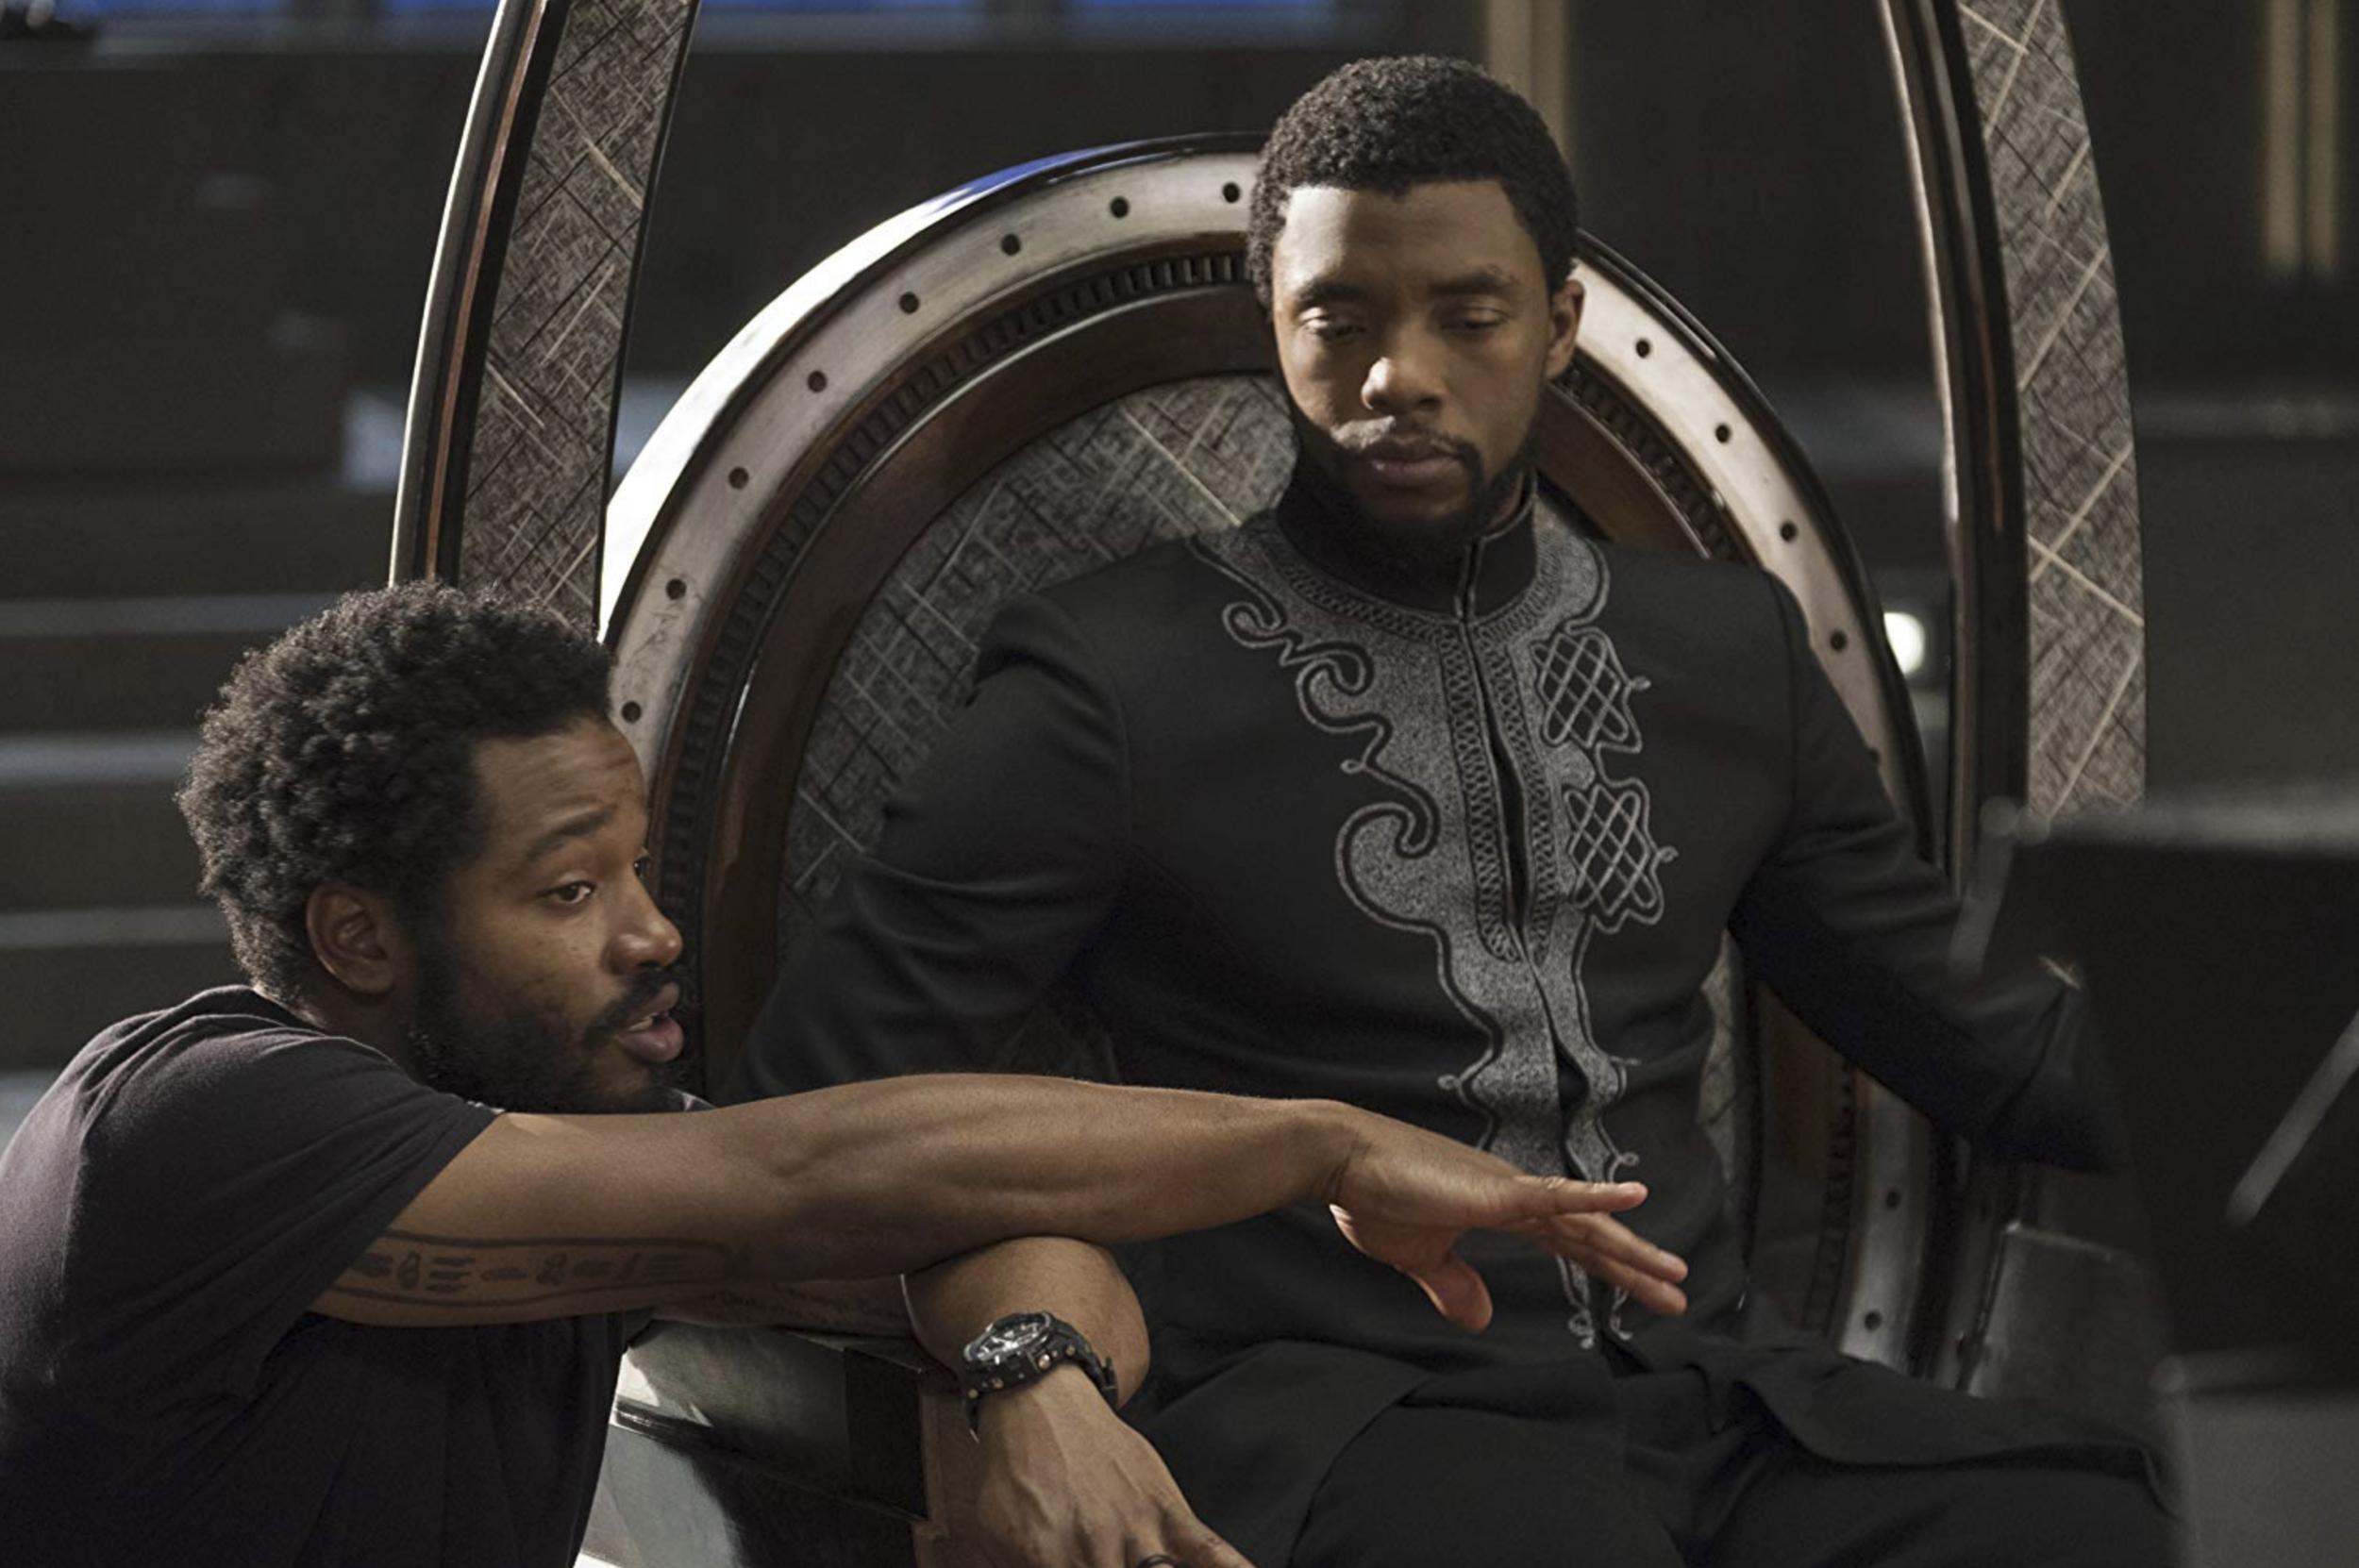 Ryan Coogler directing Chadwick Boseman in  Black Panther  (2017) - courtesy of Marvel/Disney